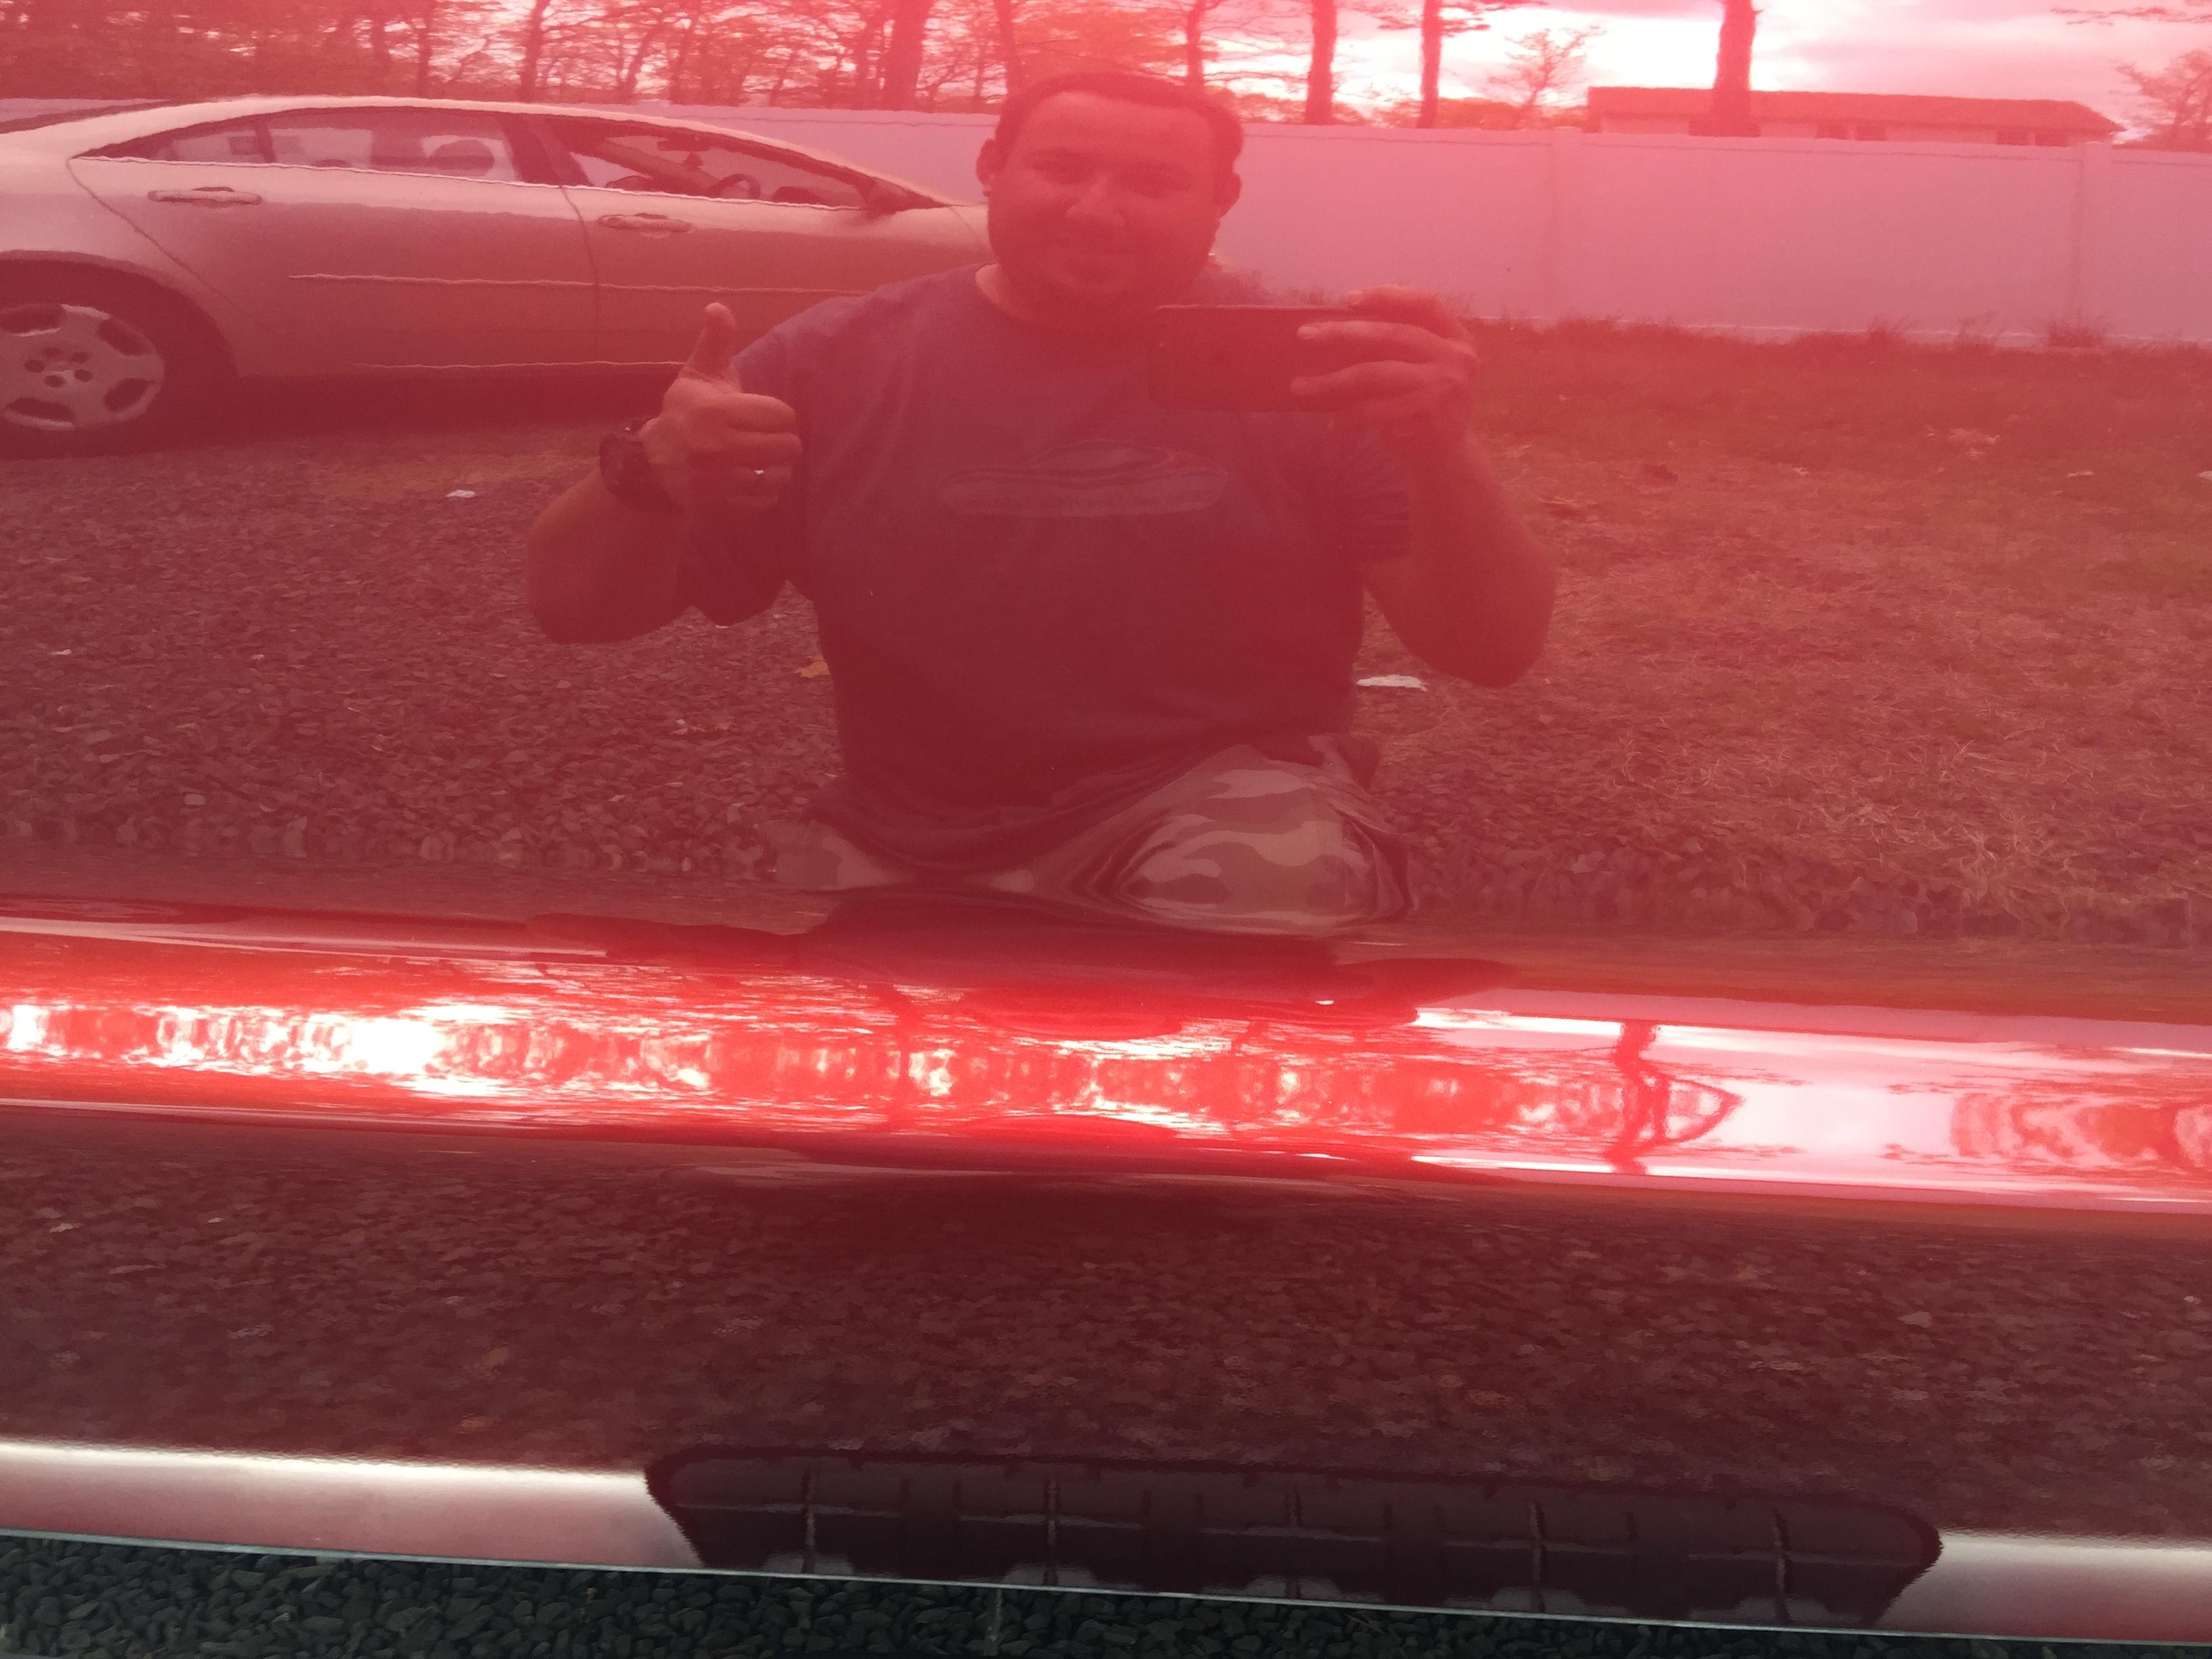 Toyota Tundra Reflection.jpg